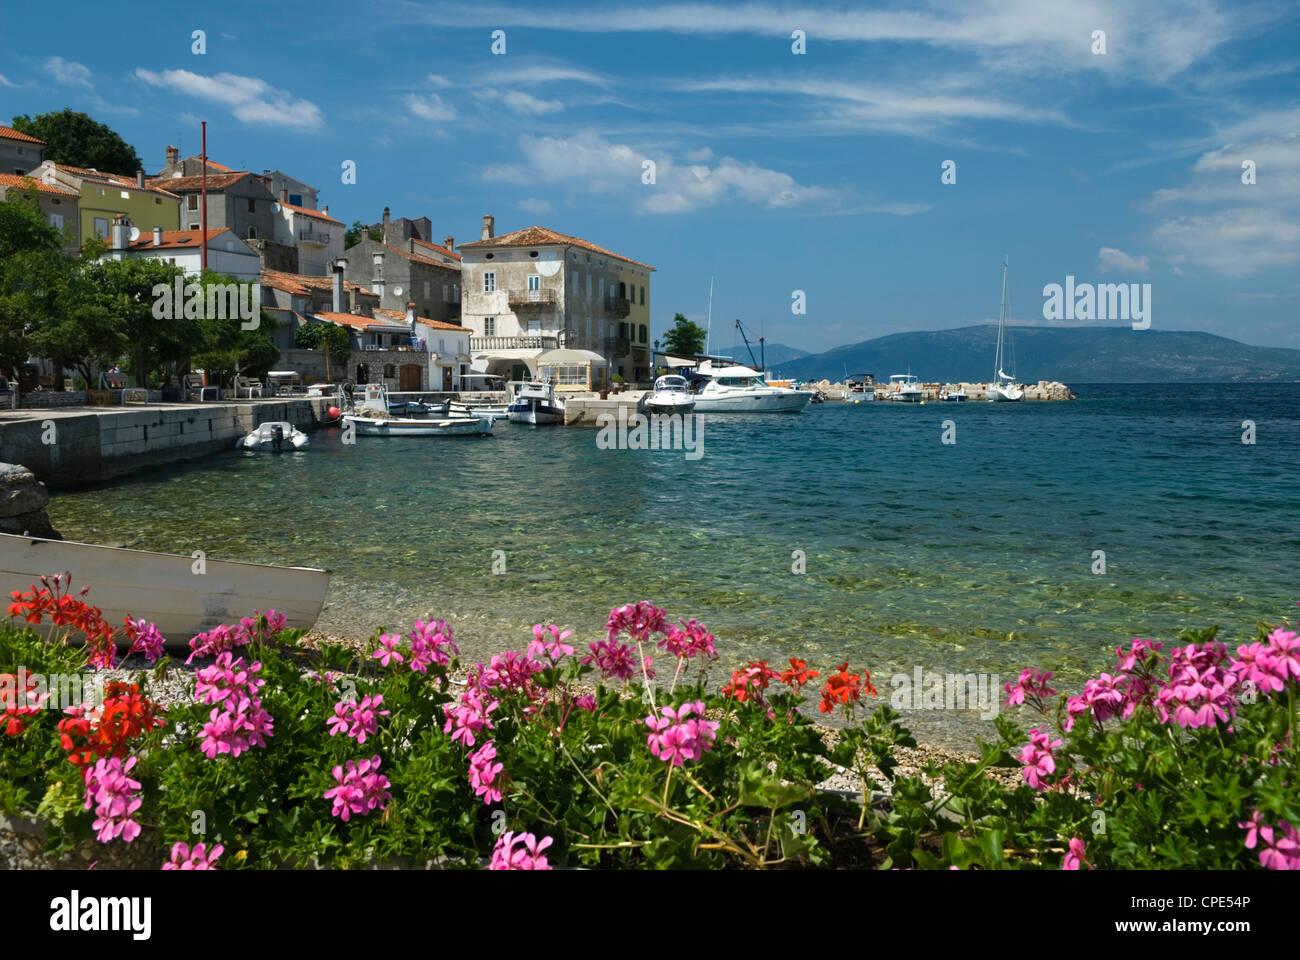 View over fishing village, Valun, Cres Island, Kvarner Gulf, Croatia, Adriatic, Europe Stock Photo